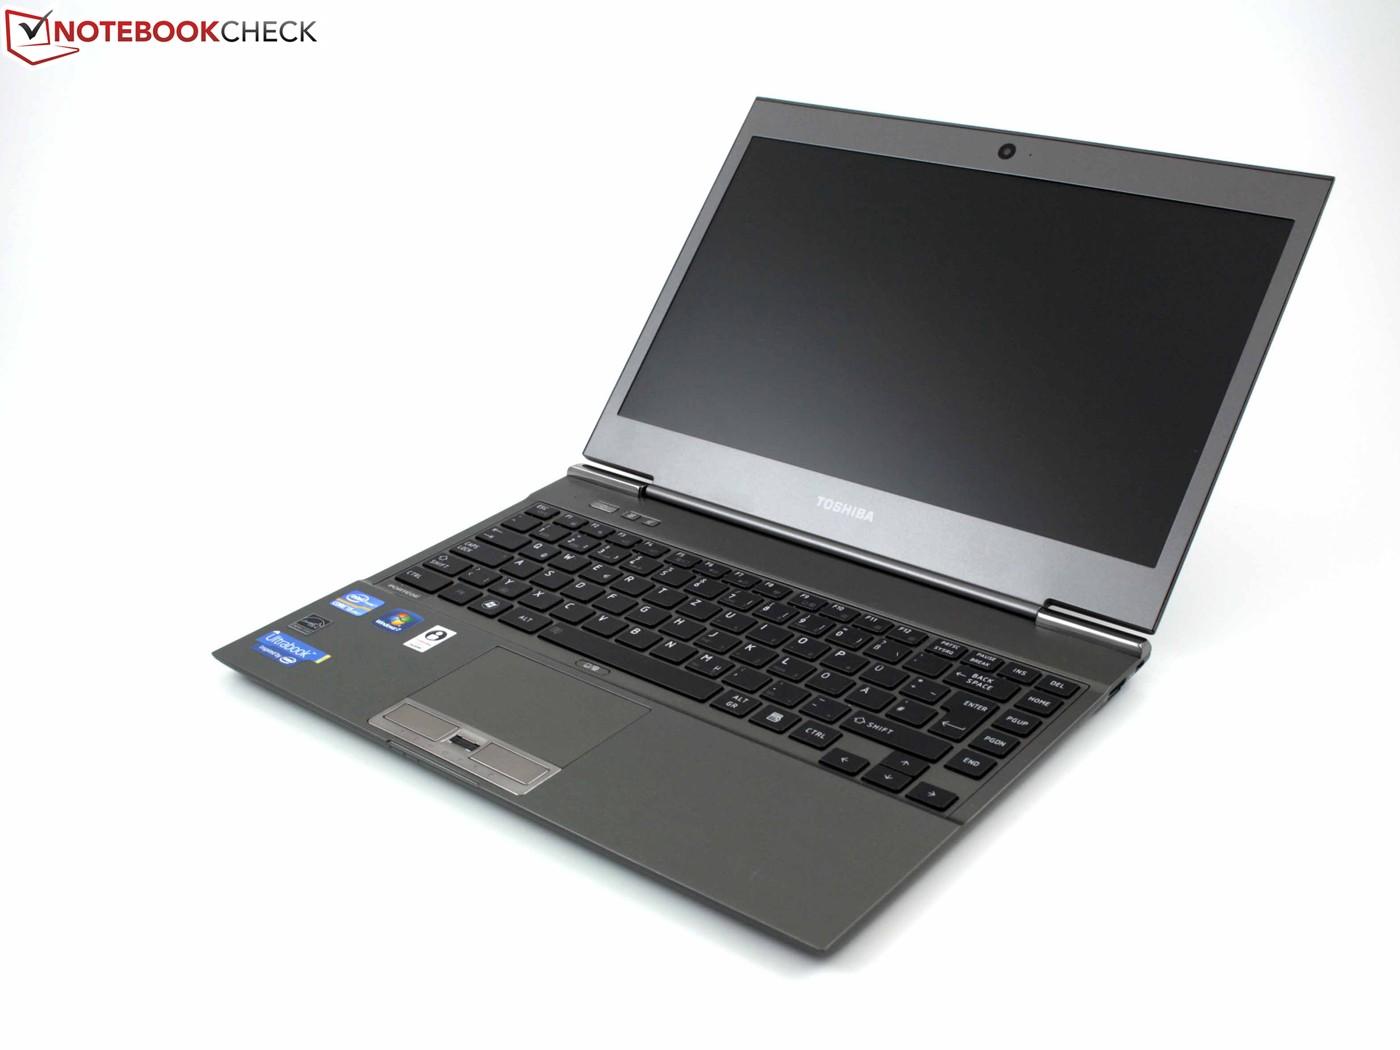 Toshiba Portege z930 - Core i5 - Thế hệ 2